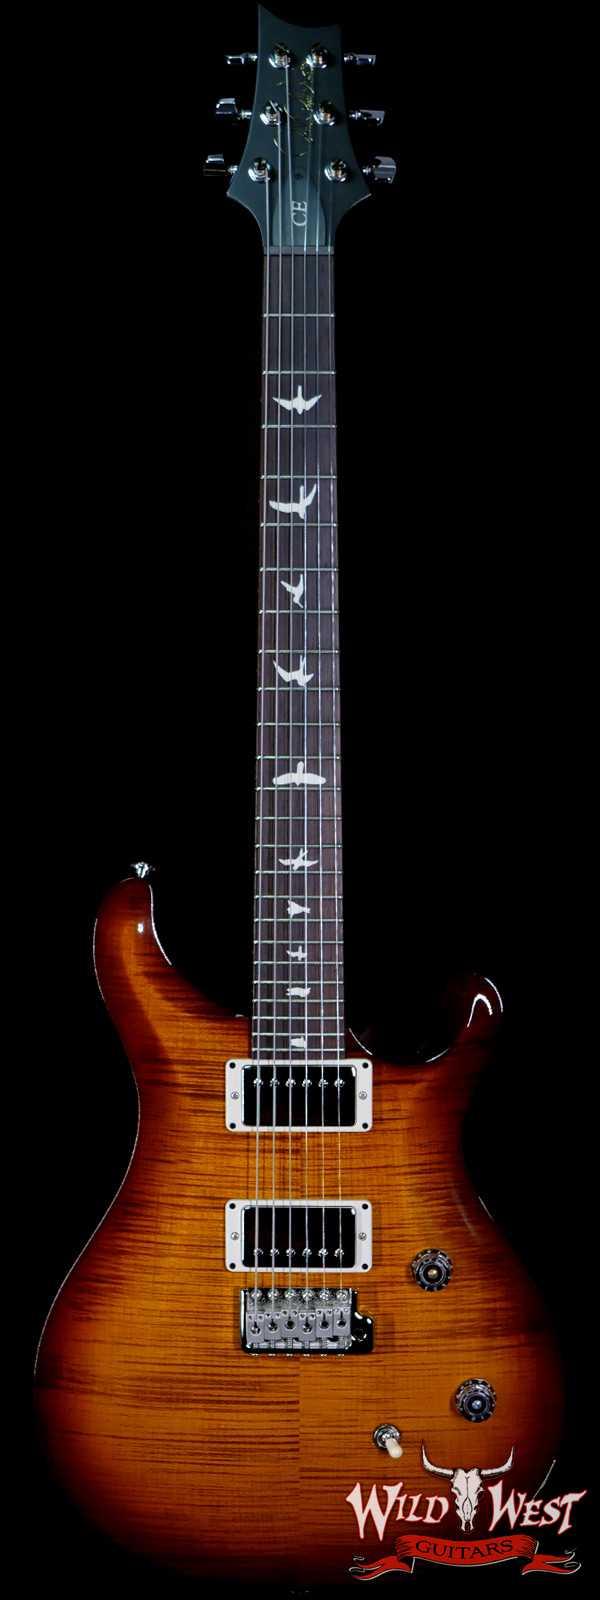 PRS Wild West Guitars Special Run Flame Top Black Neck CE 24 57/08 Pickups Violin Amber Burst 322360